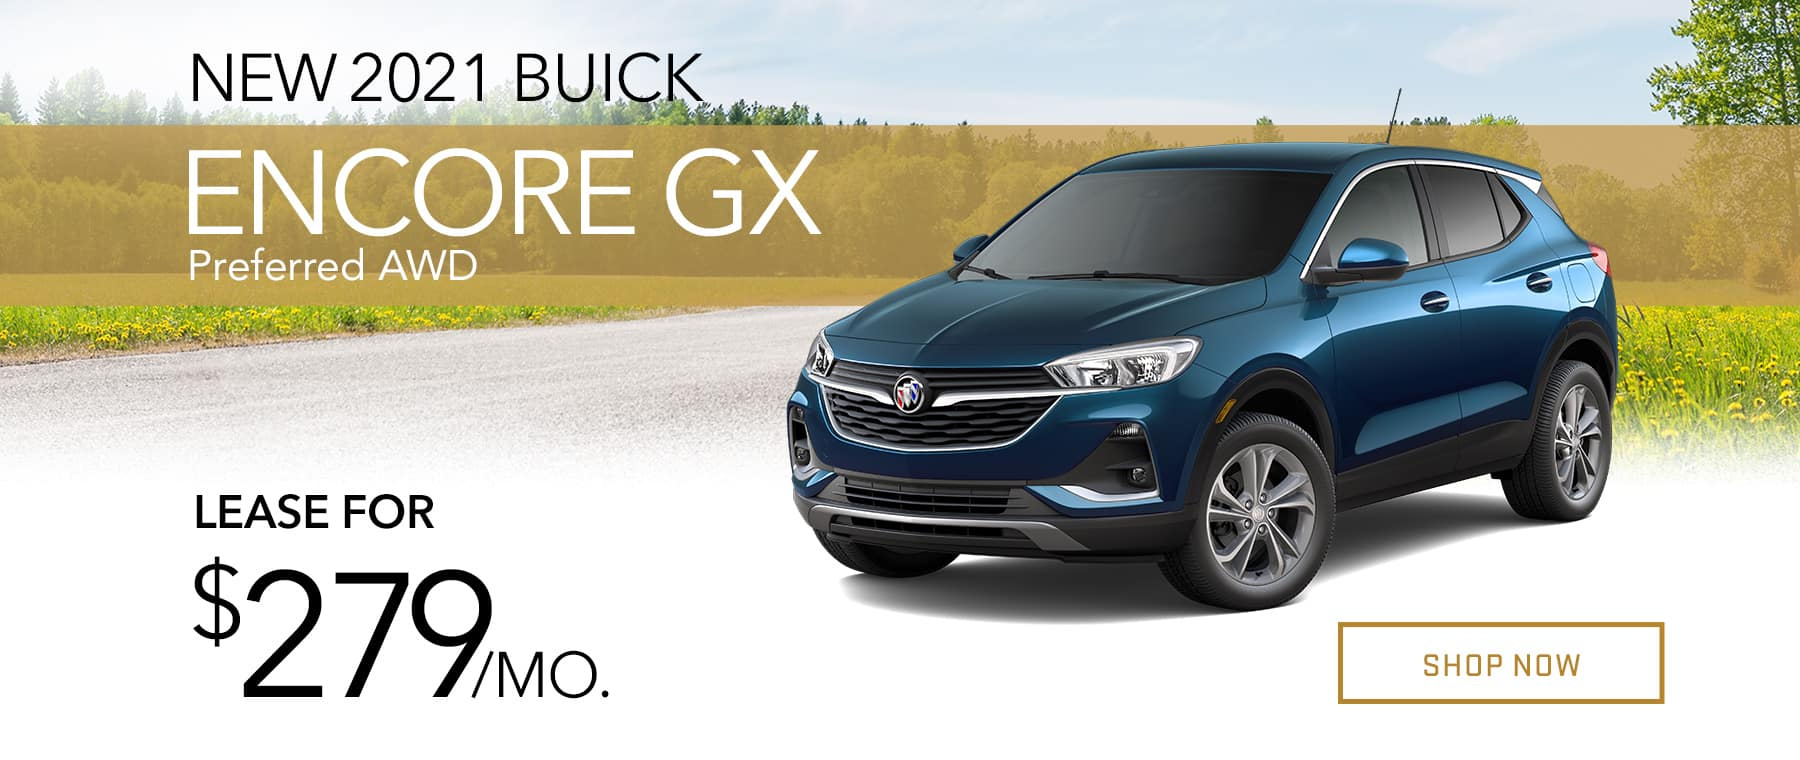 BCO-1800×760-New 2021 Buick Encore GX Preferred AWD_0721